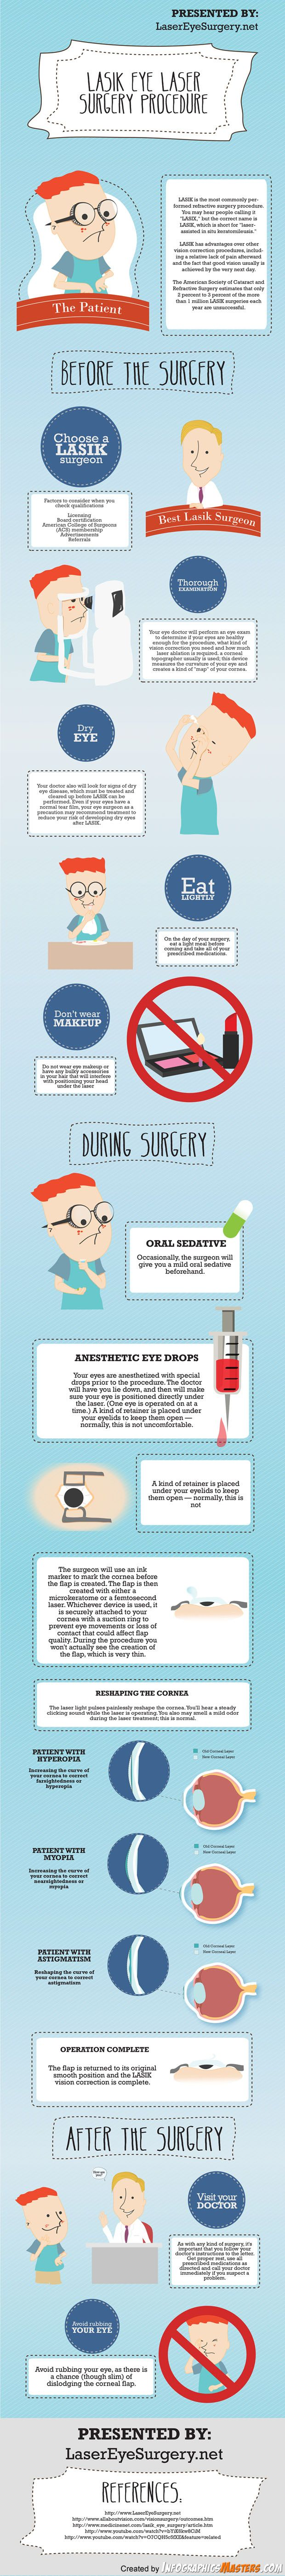 Lasik Eye Laser Surgery Procedure [Infographic] http://www.lshf.org/